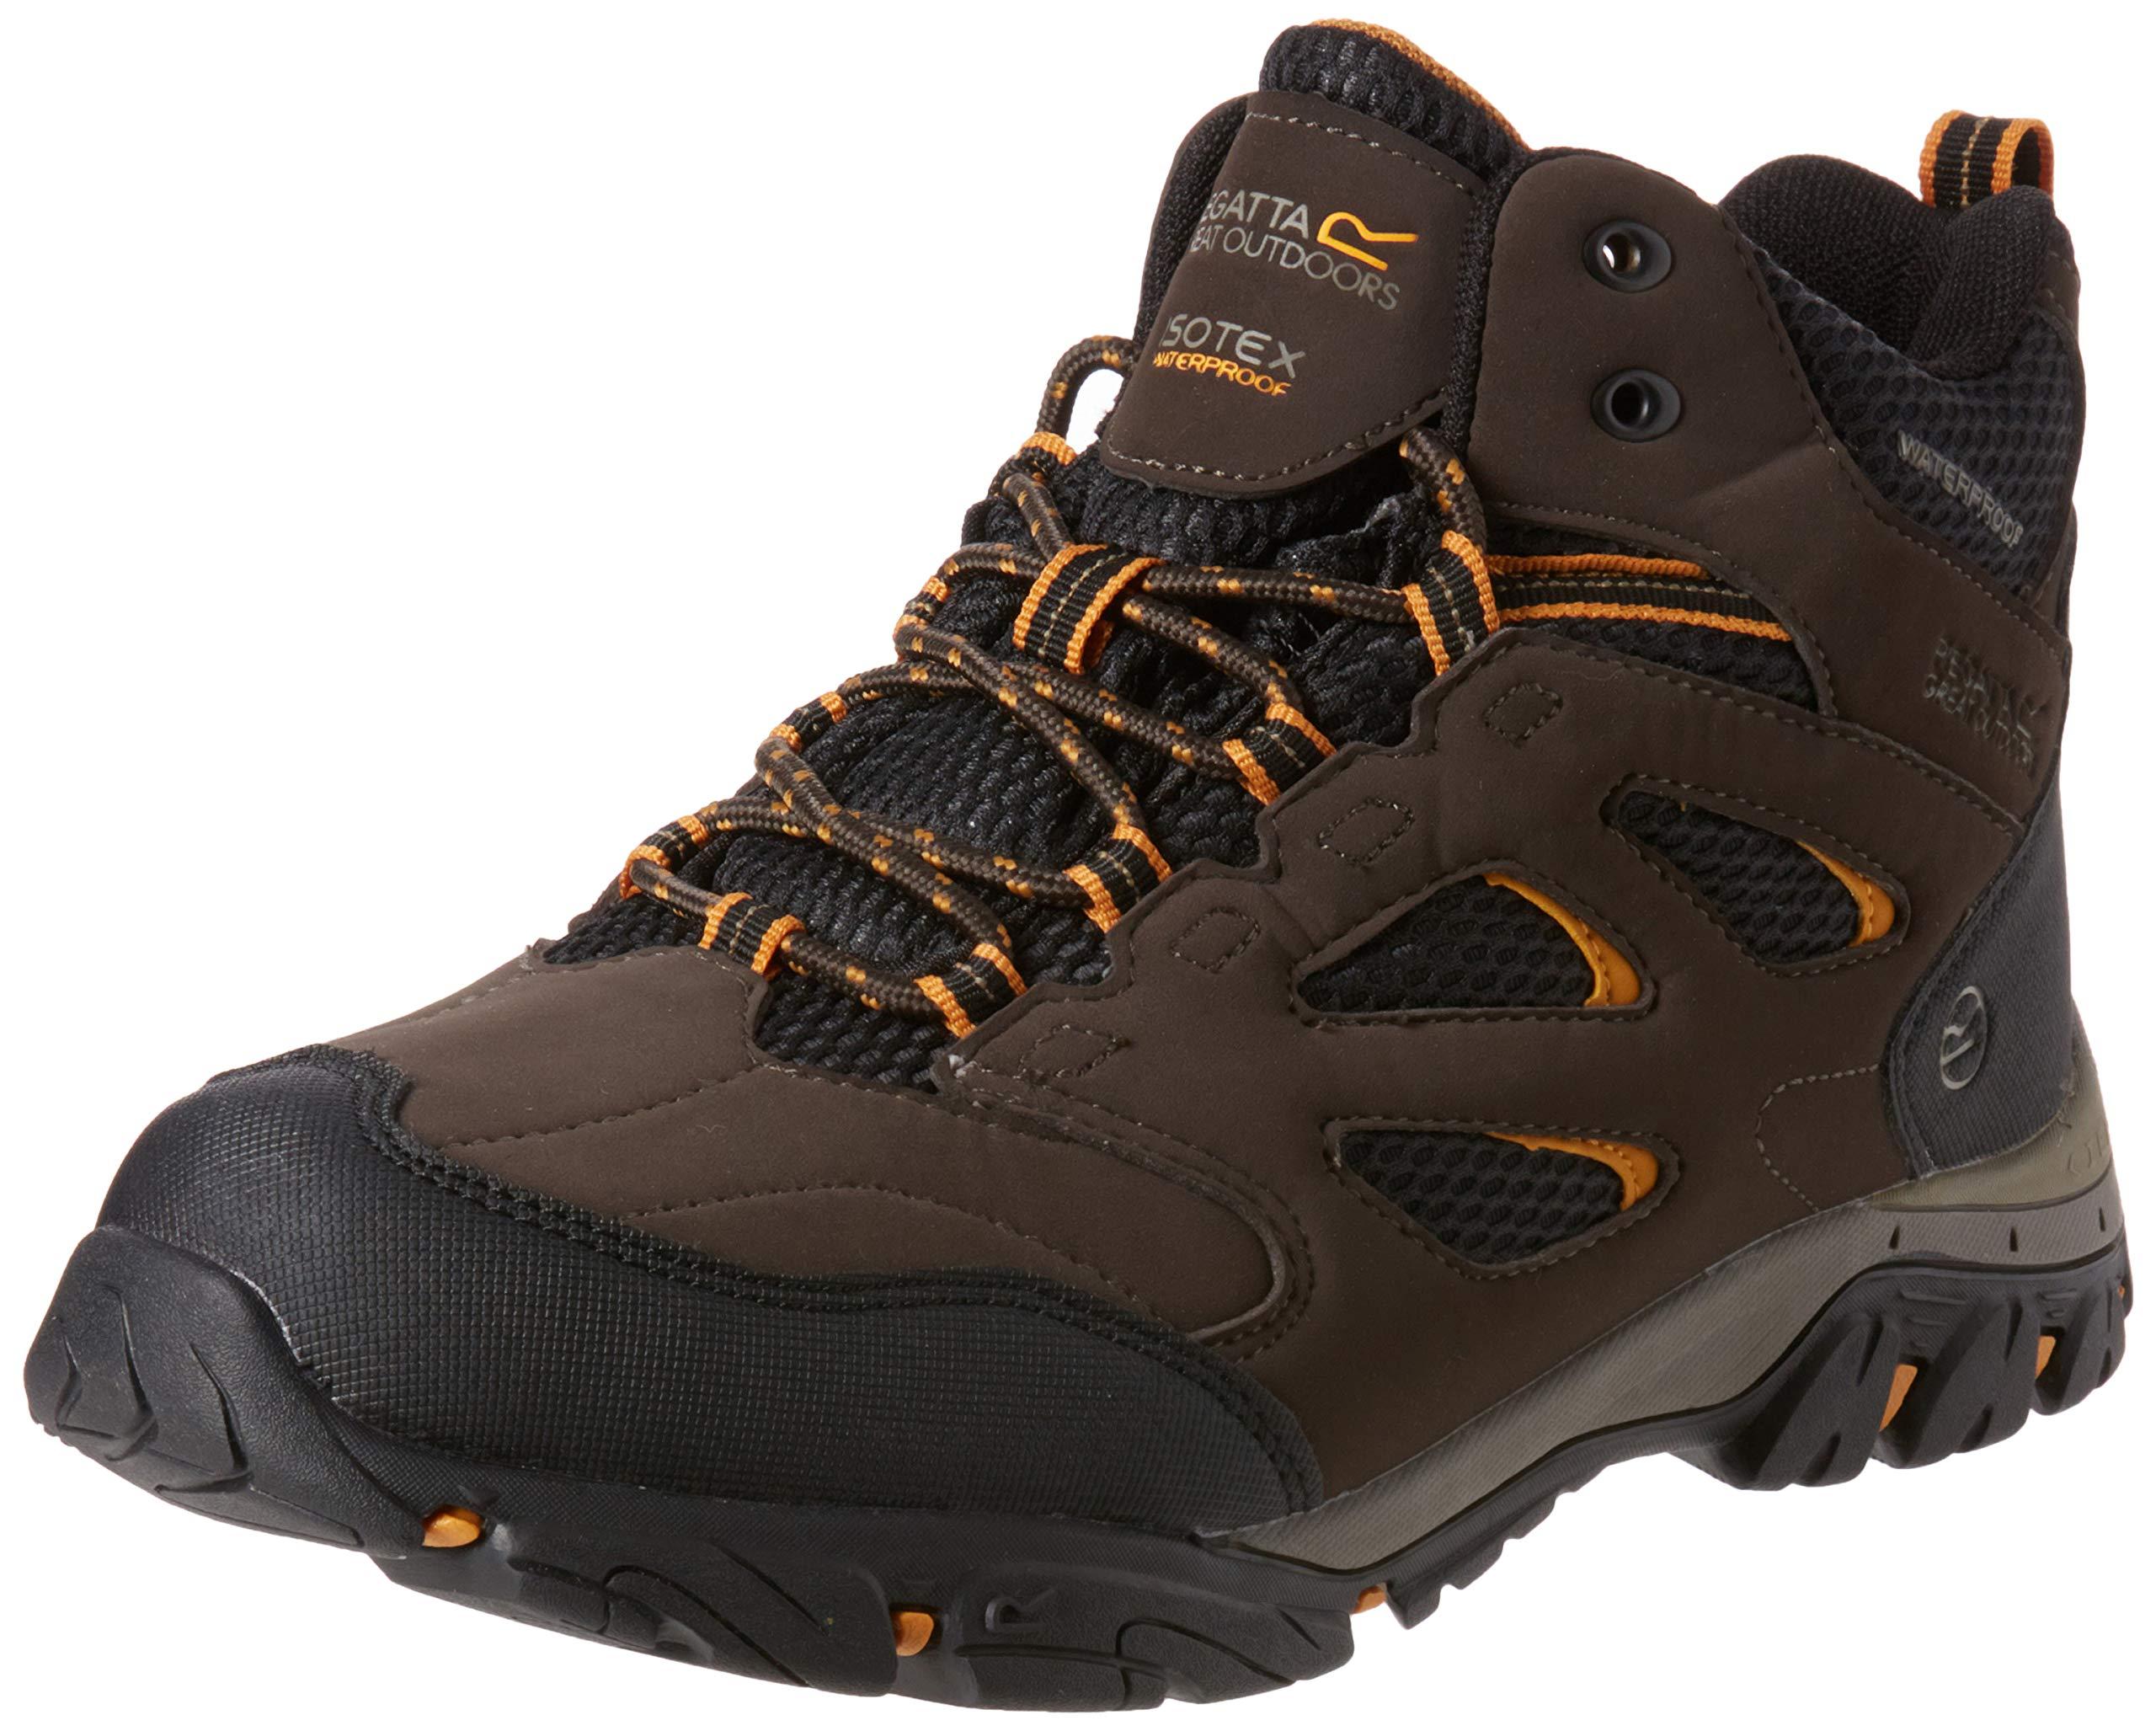 Regatta Men's Holcombe IEP Mid High Rise Hiking Boots 1